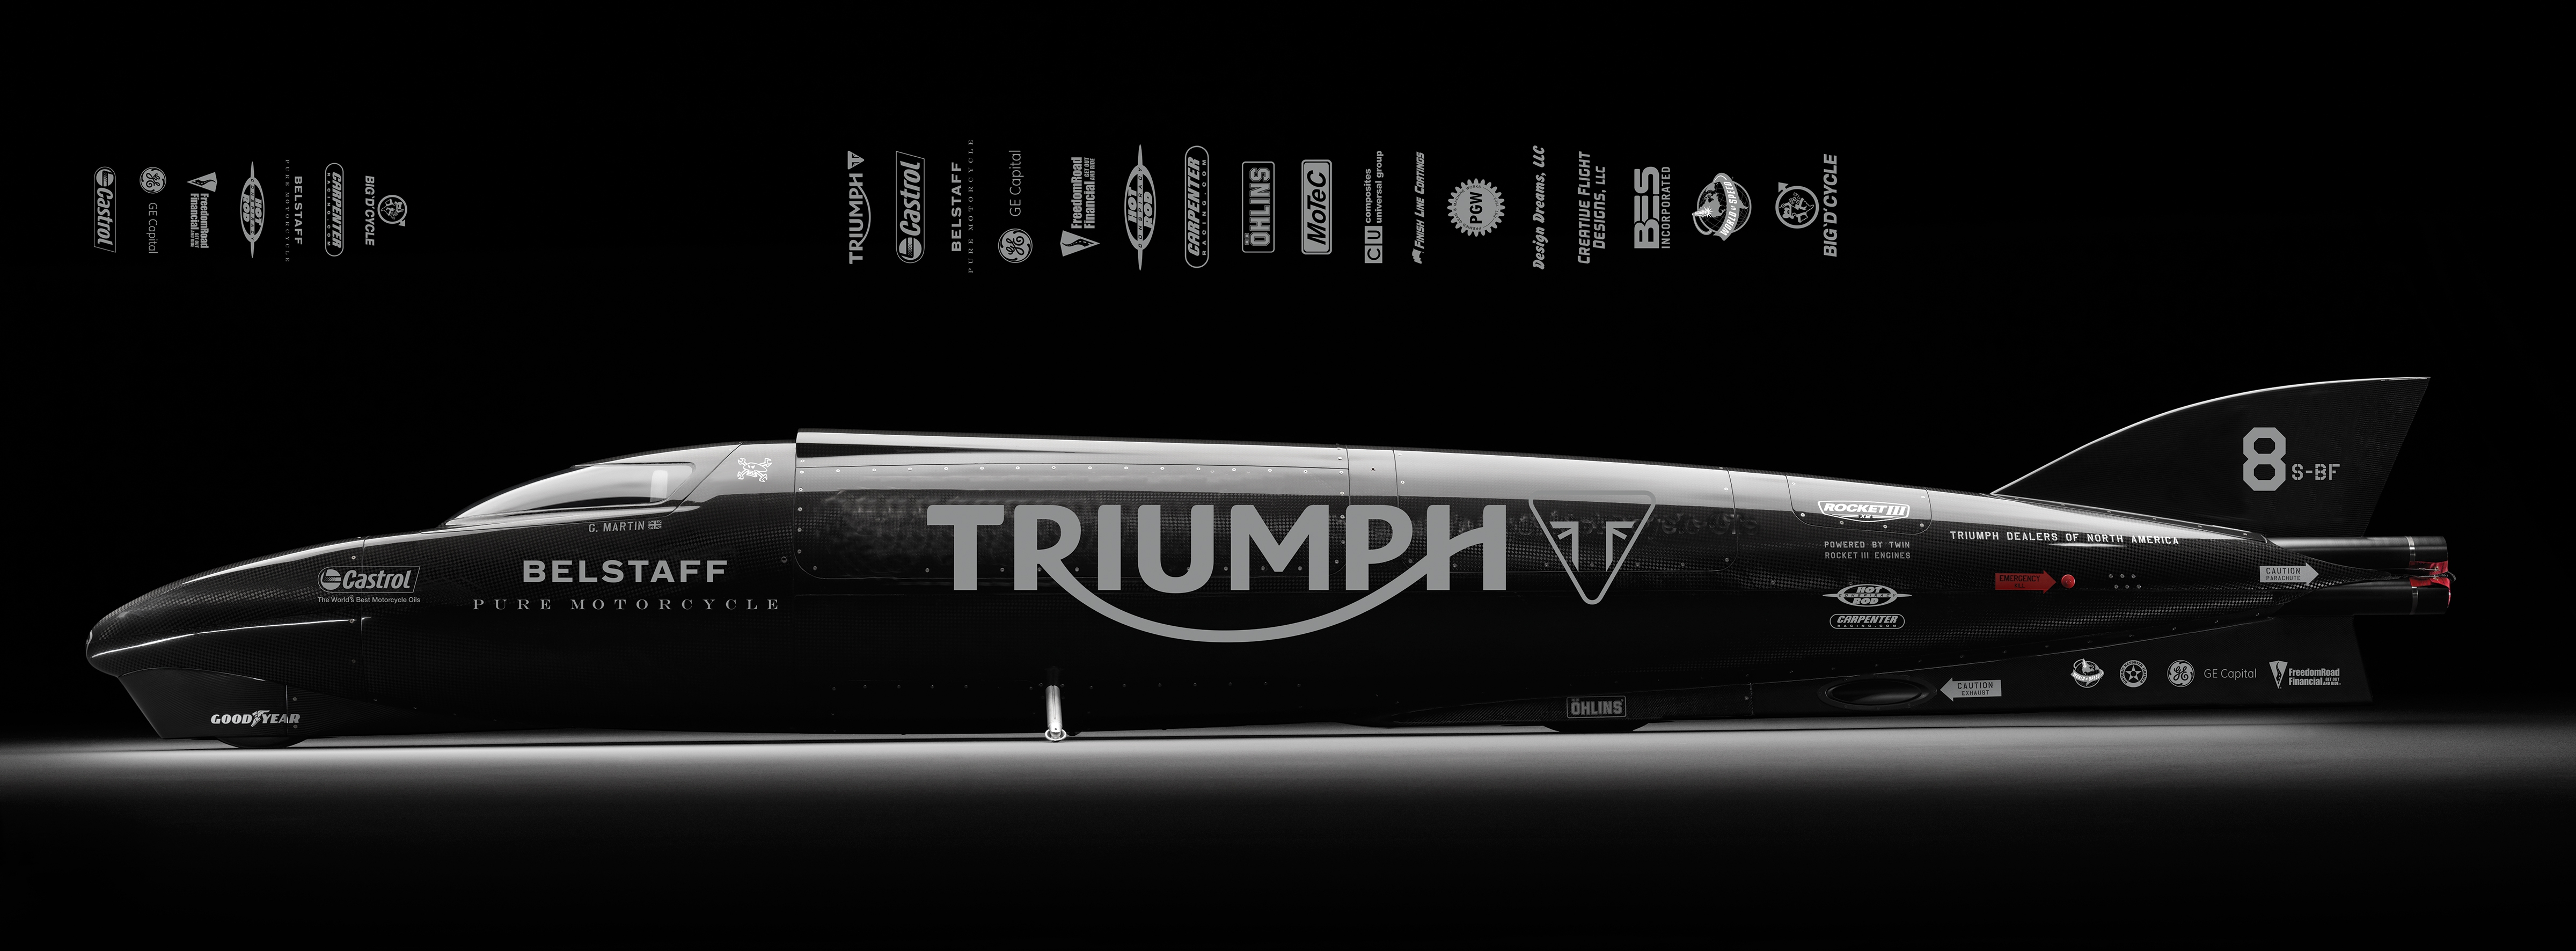 triumphlsr1.jpg